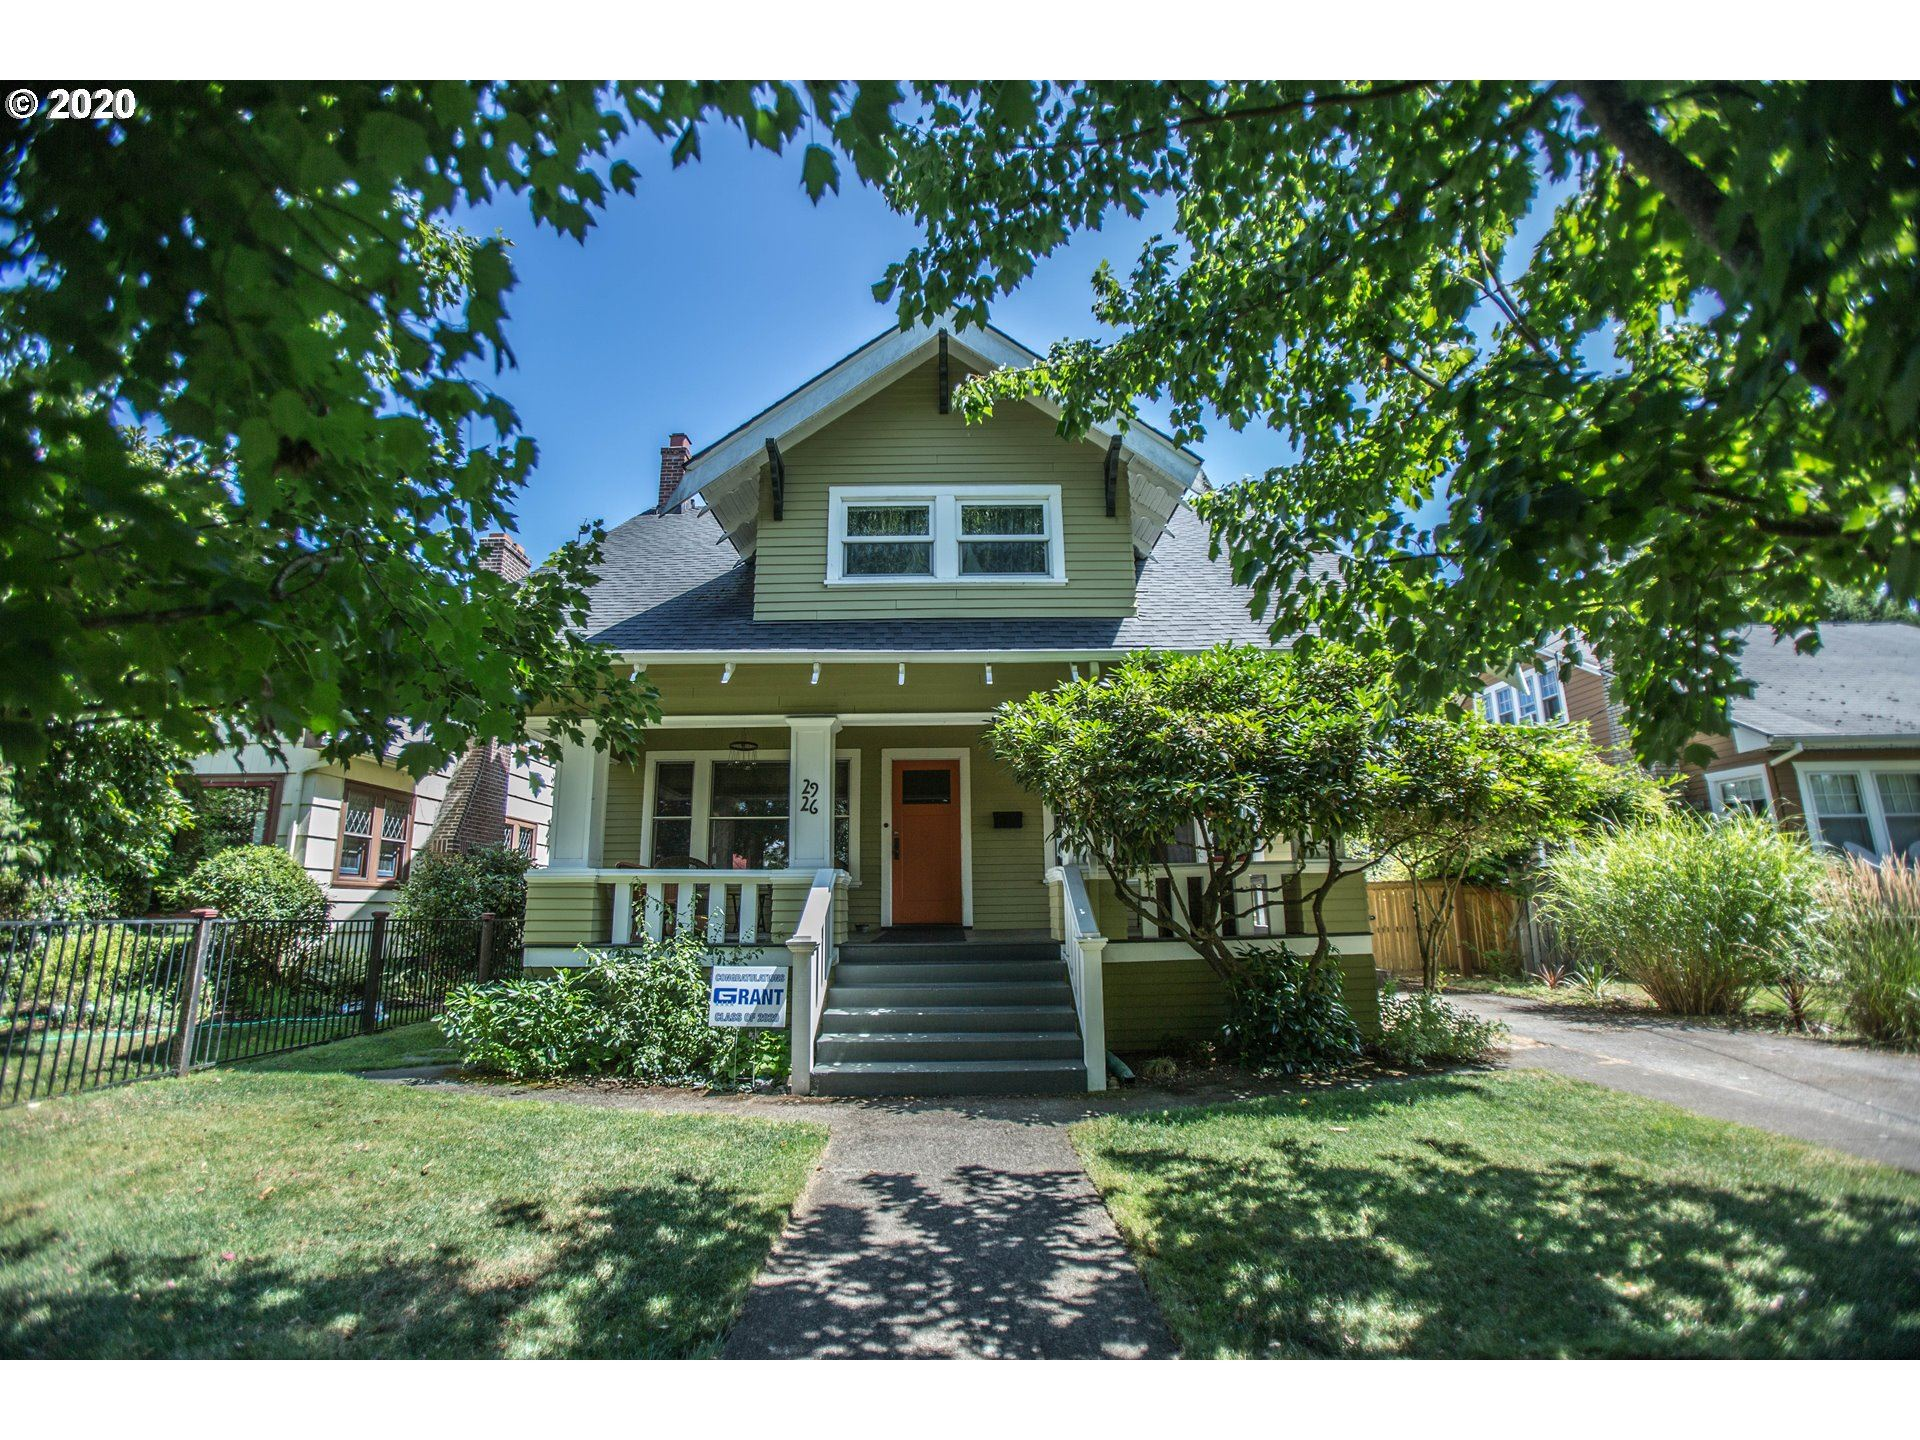 2926 NE 56TH AVE, Portland, OR 97213 - MLS#: 20046504